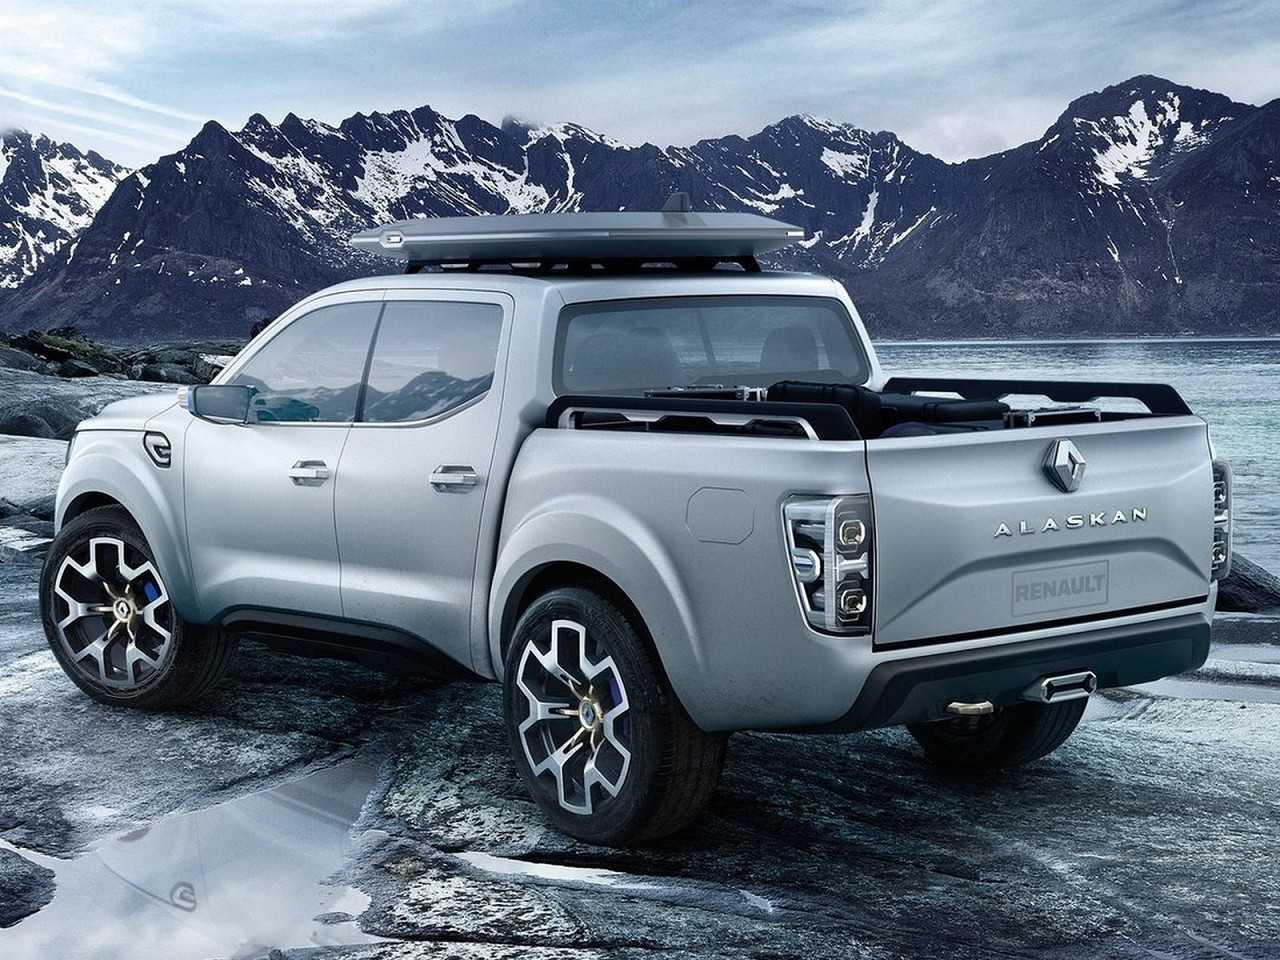 RenaultAlaskan 2016 - ângulo traseiro